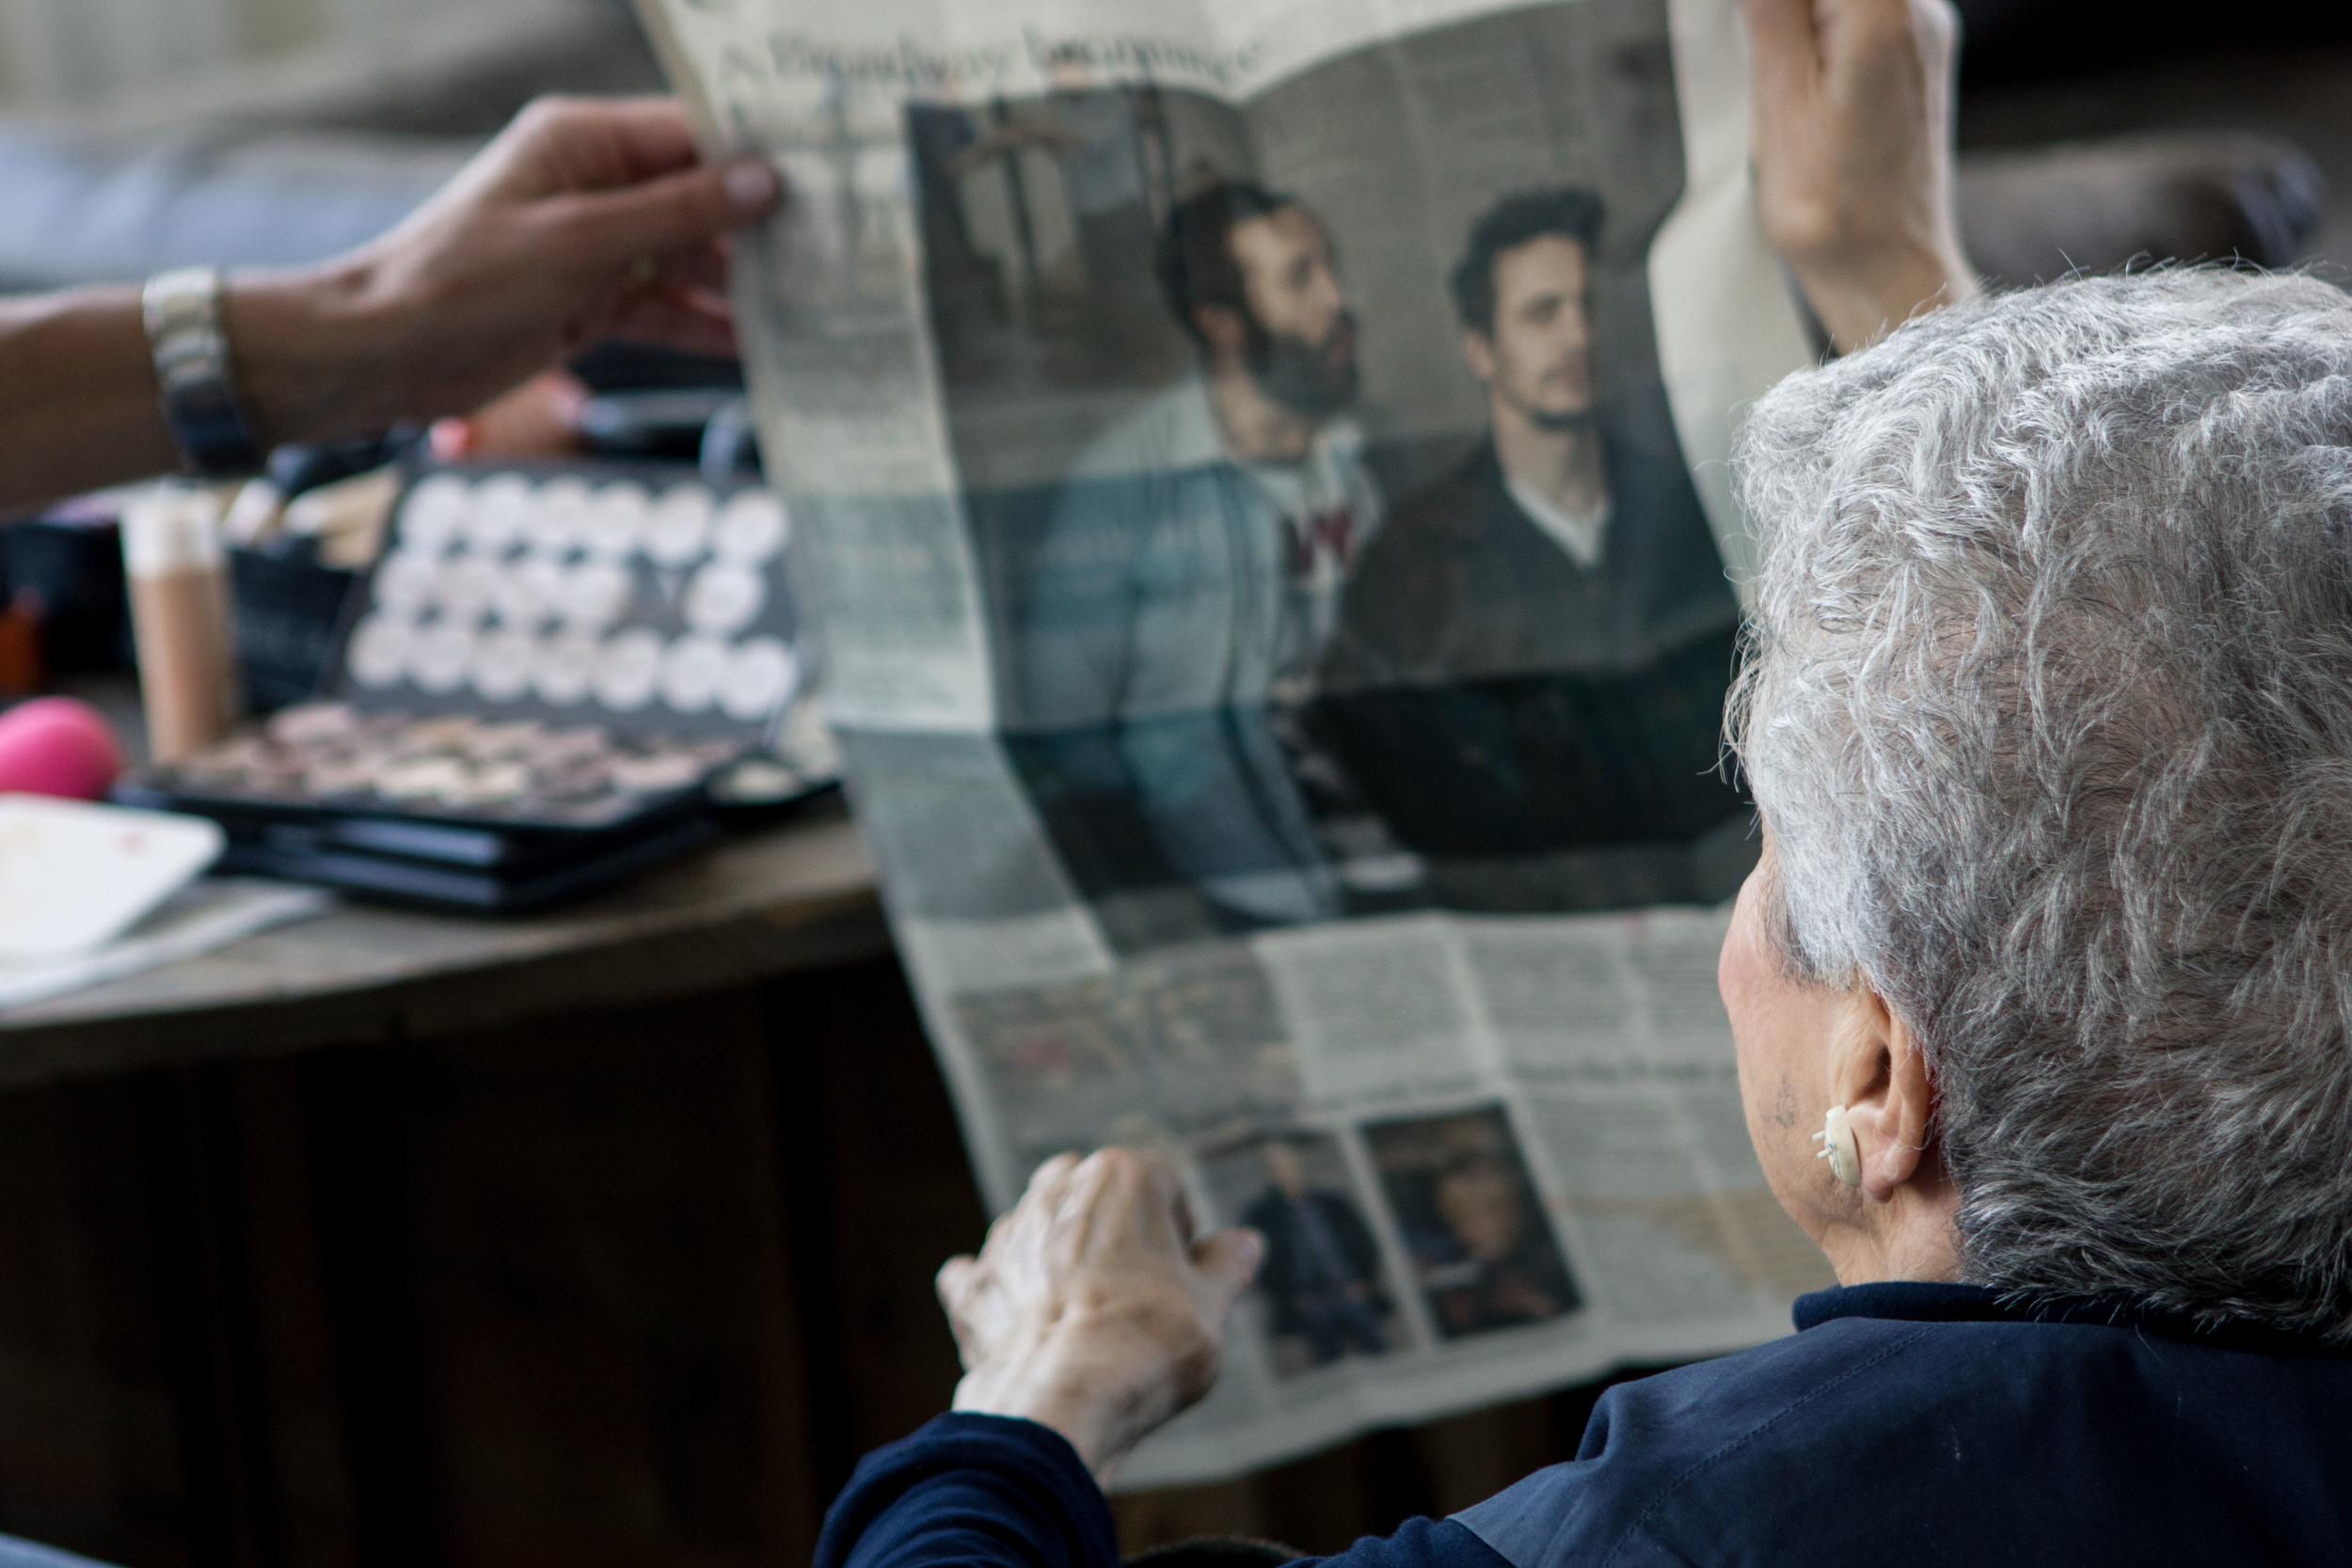 Mitze Verne showing off her grandson, James Franco, in a newspaper article.